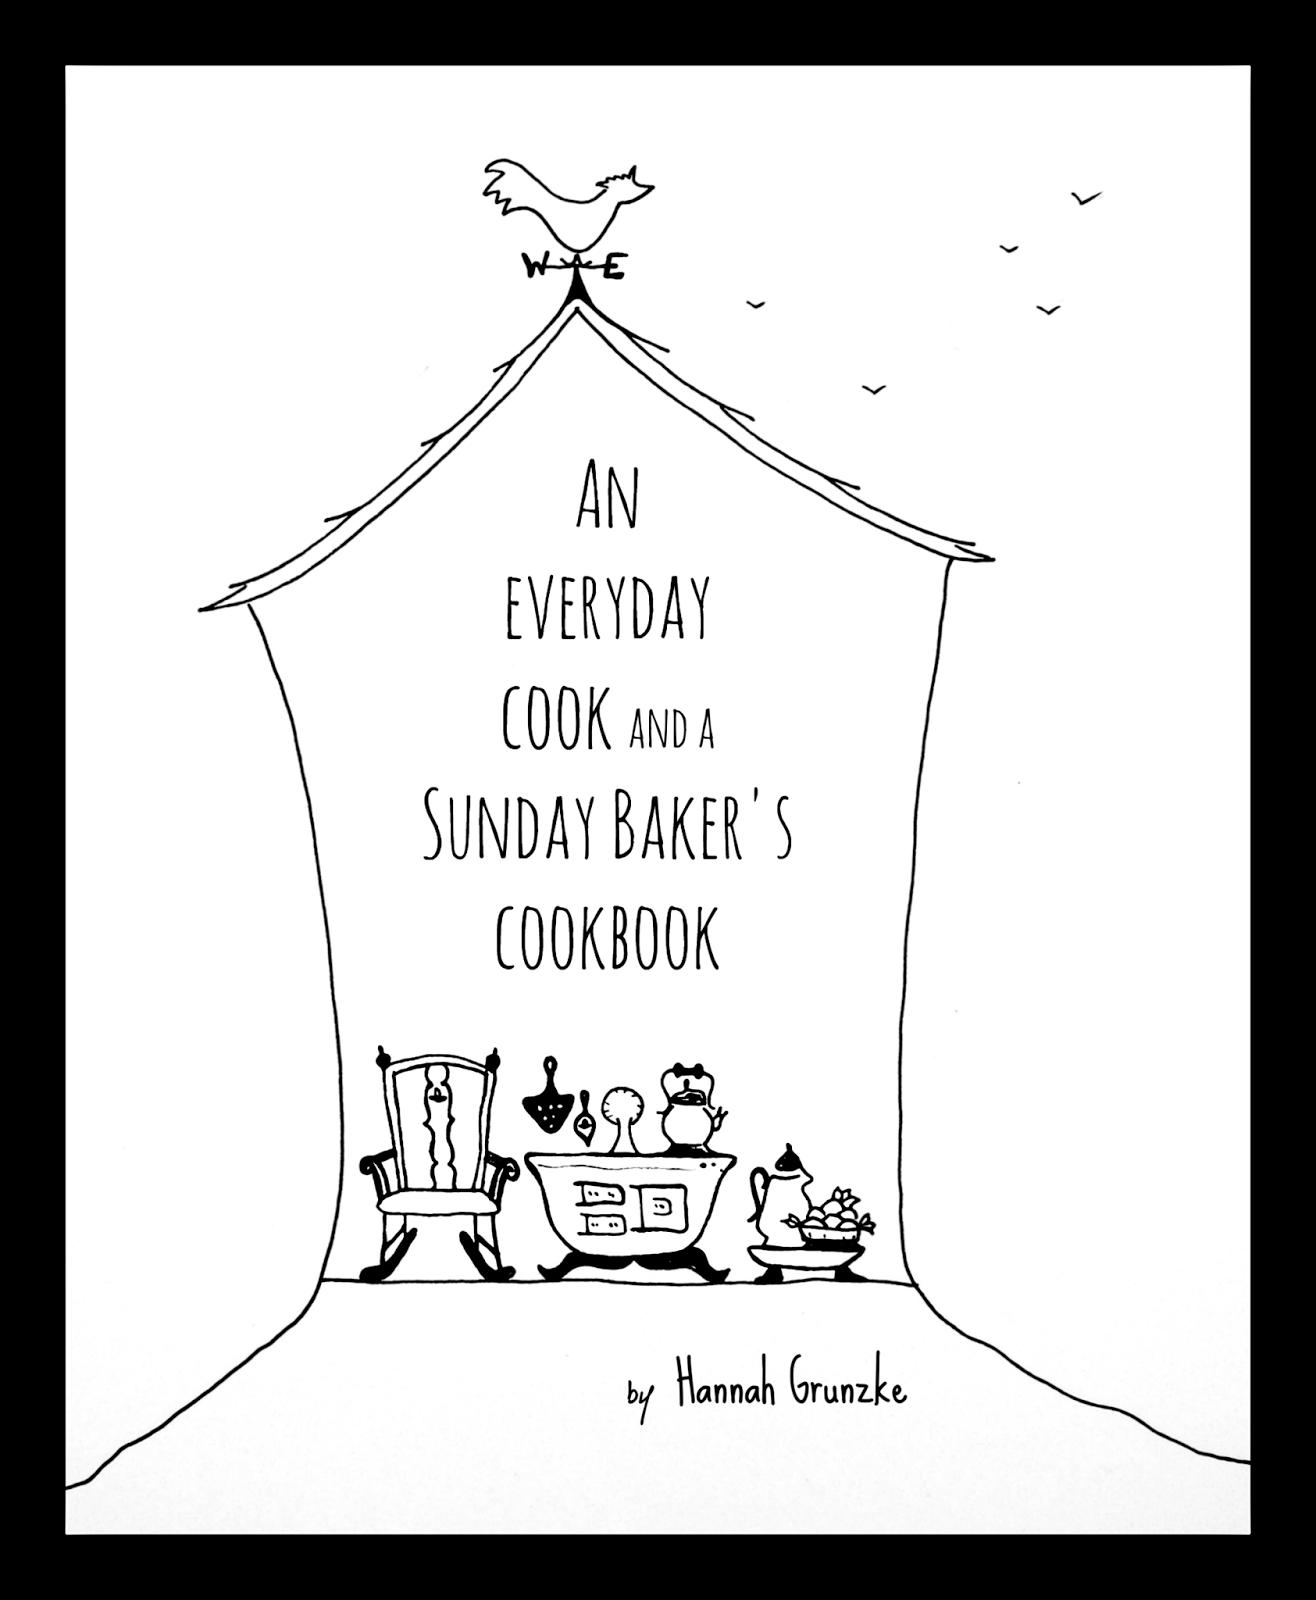 Recipe book clipart free black and white image black and white library Clipart Cookbook Cover ✓ All About Clipart image black and white library